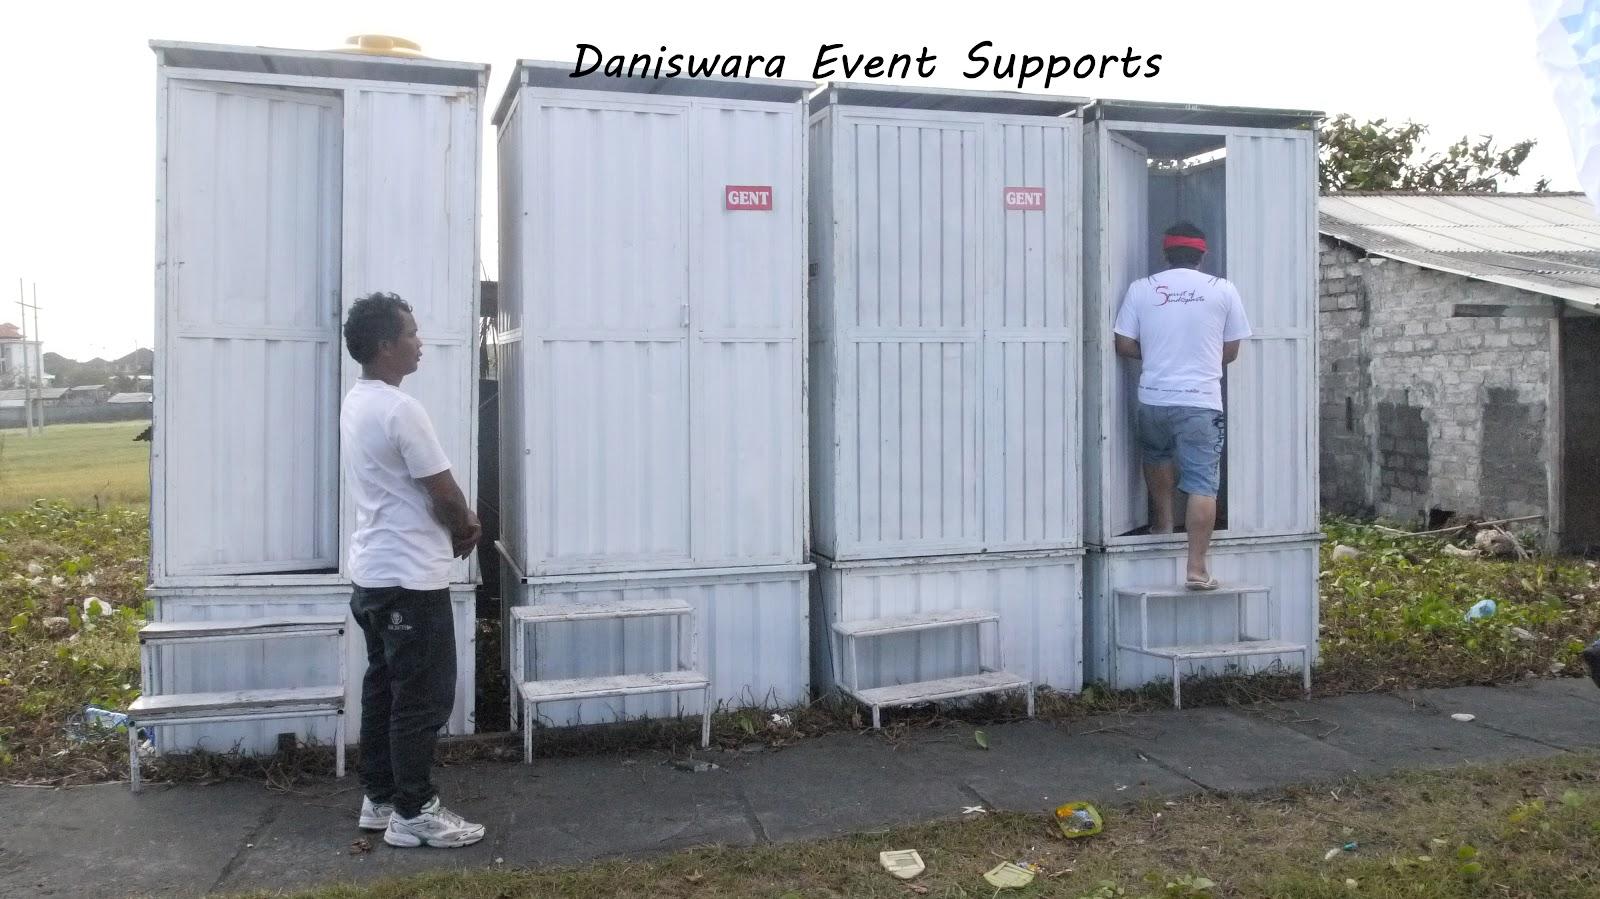 Sewa Tenda Dan Peralatan Pesta Di Bali Toilet Portable